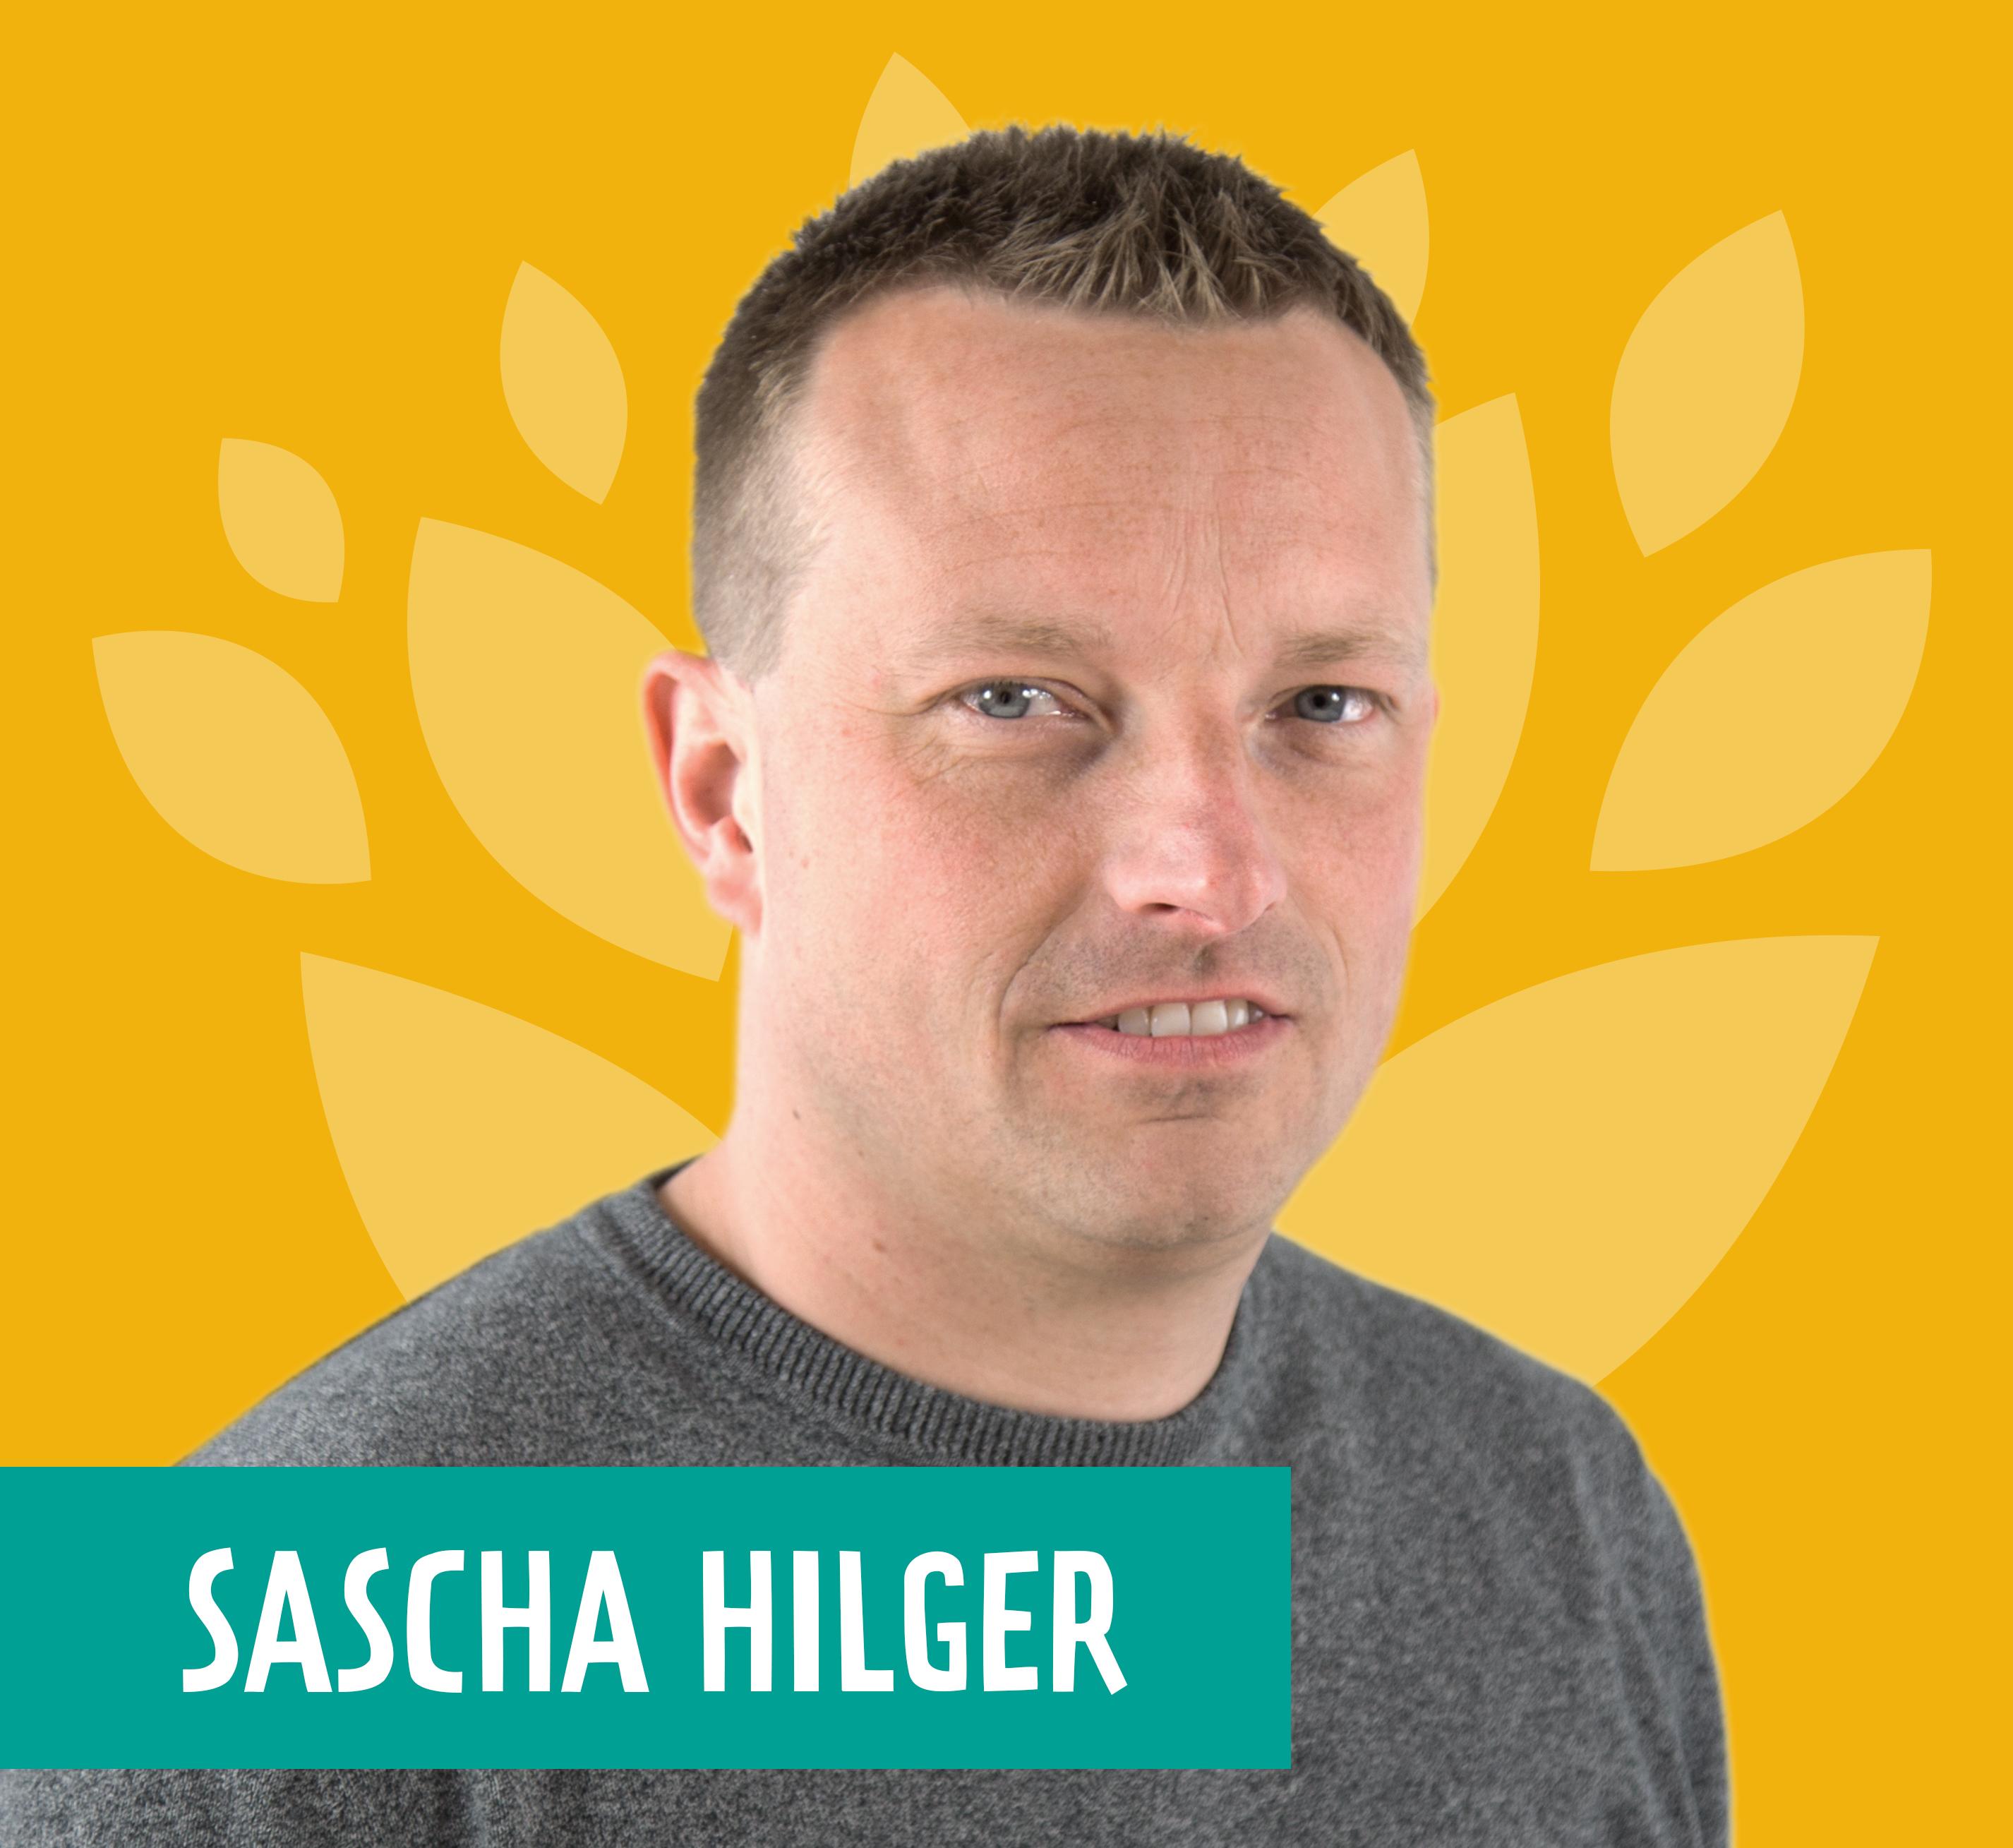 Sascha Hilger